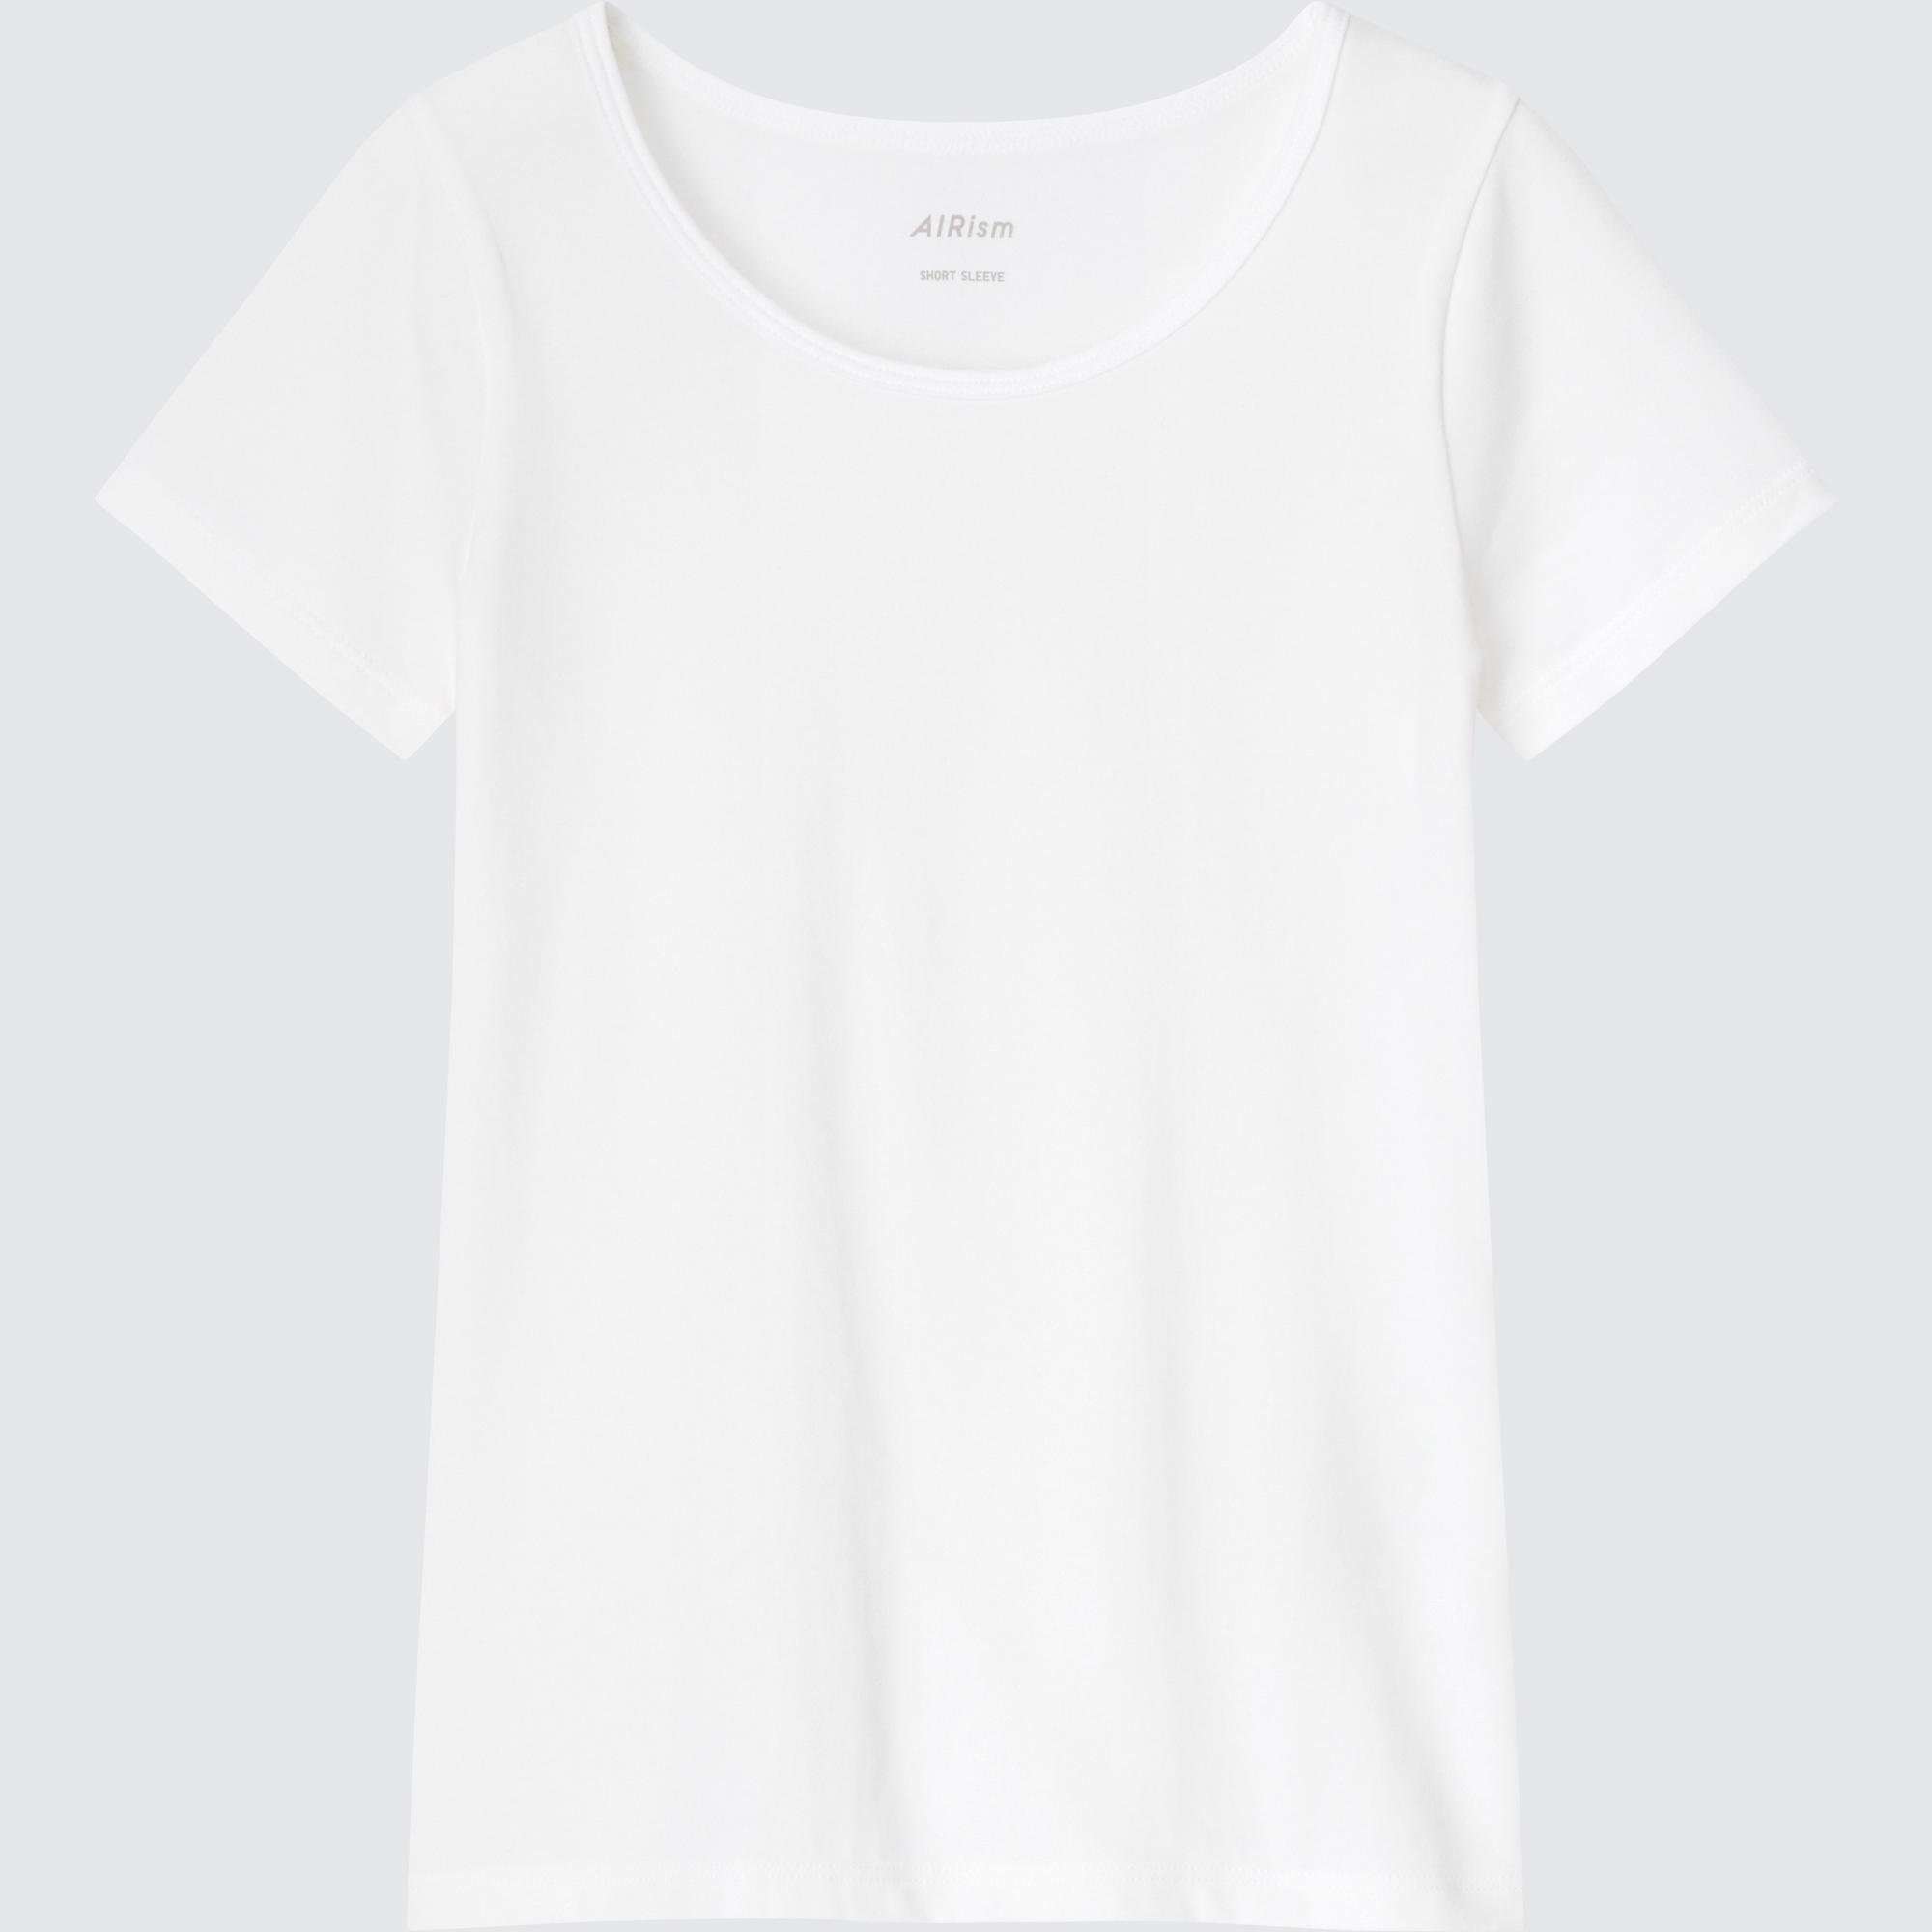 Uniqlo KIDS AIRISM COTTON BLEND SHORT-SLEEVE SCOOP NECK T-SHIRT